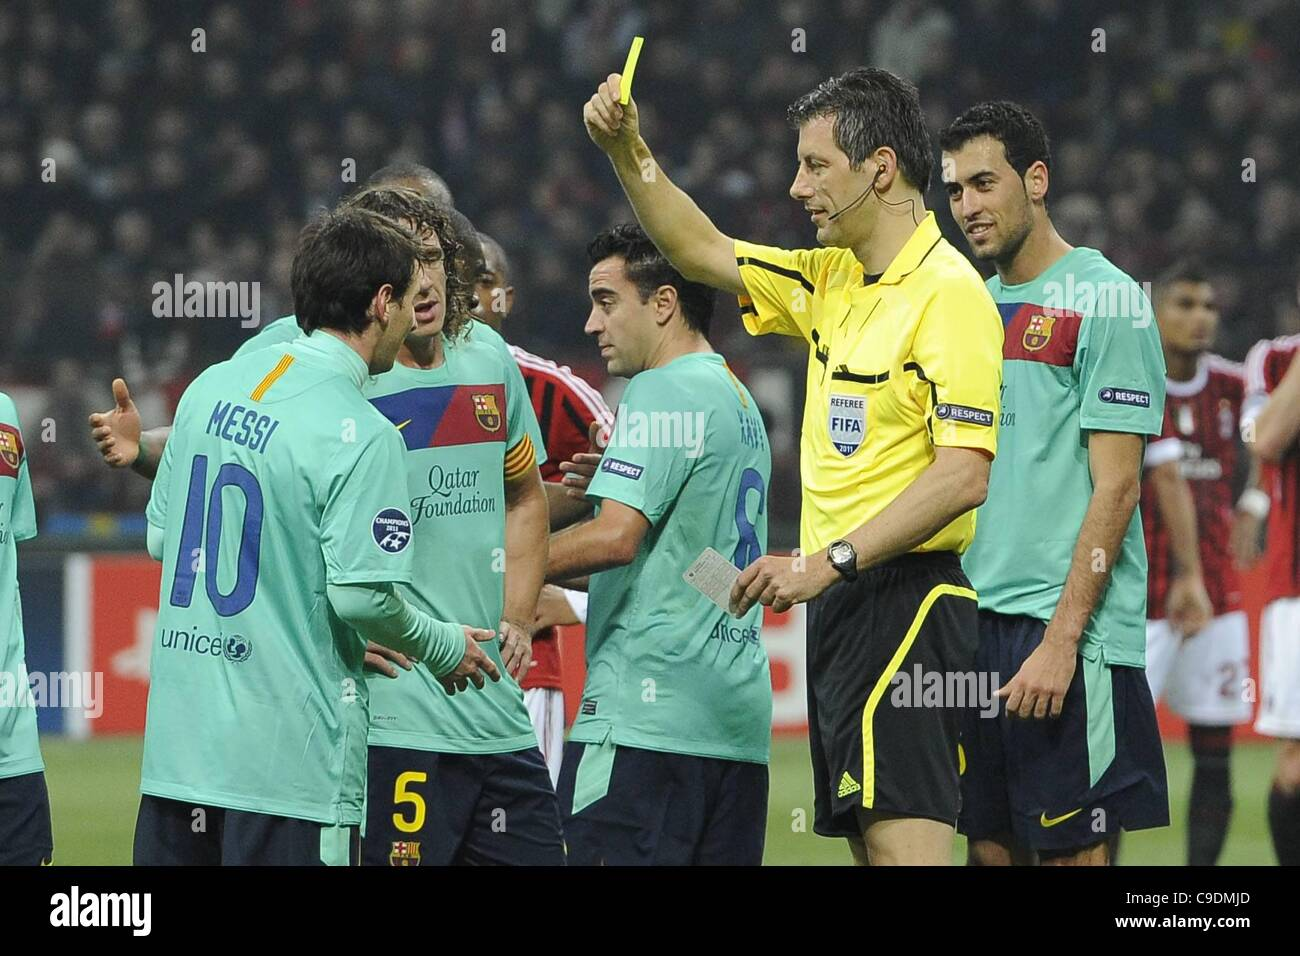 23 11 2011 Milan Italy Champions League Ac Milan Versus Barcelona Stock Photo Alamy